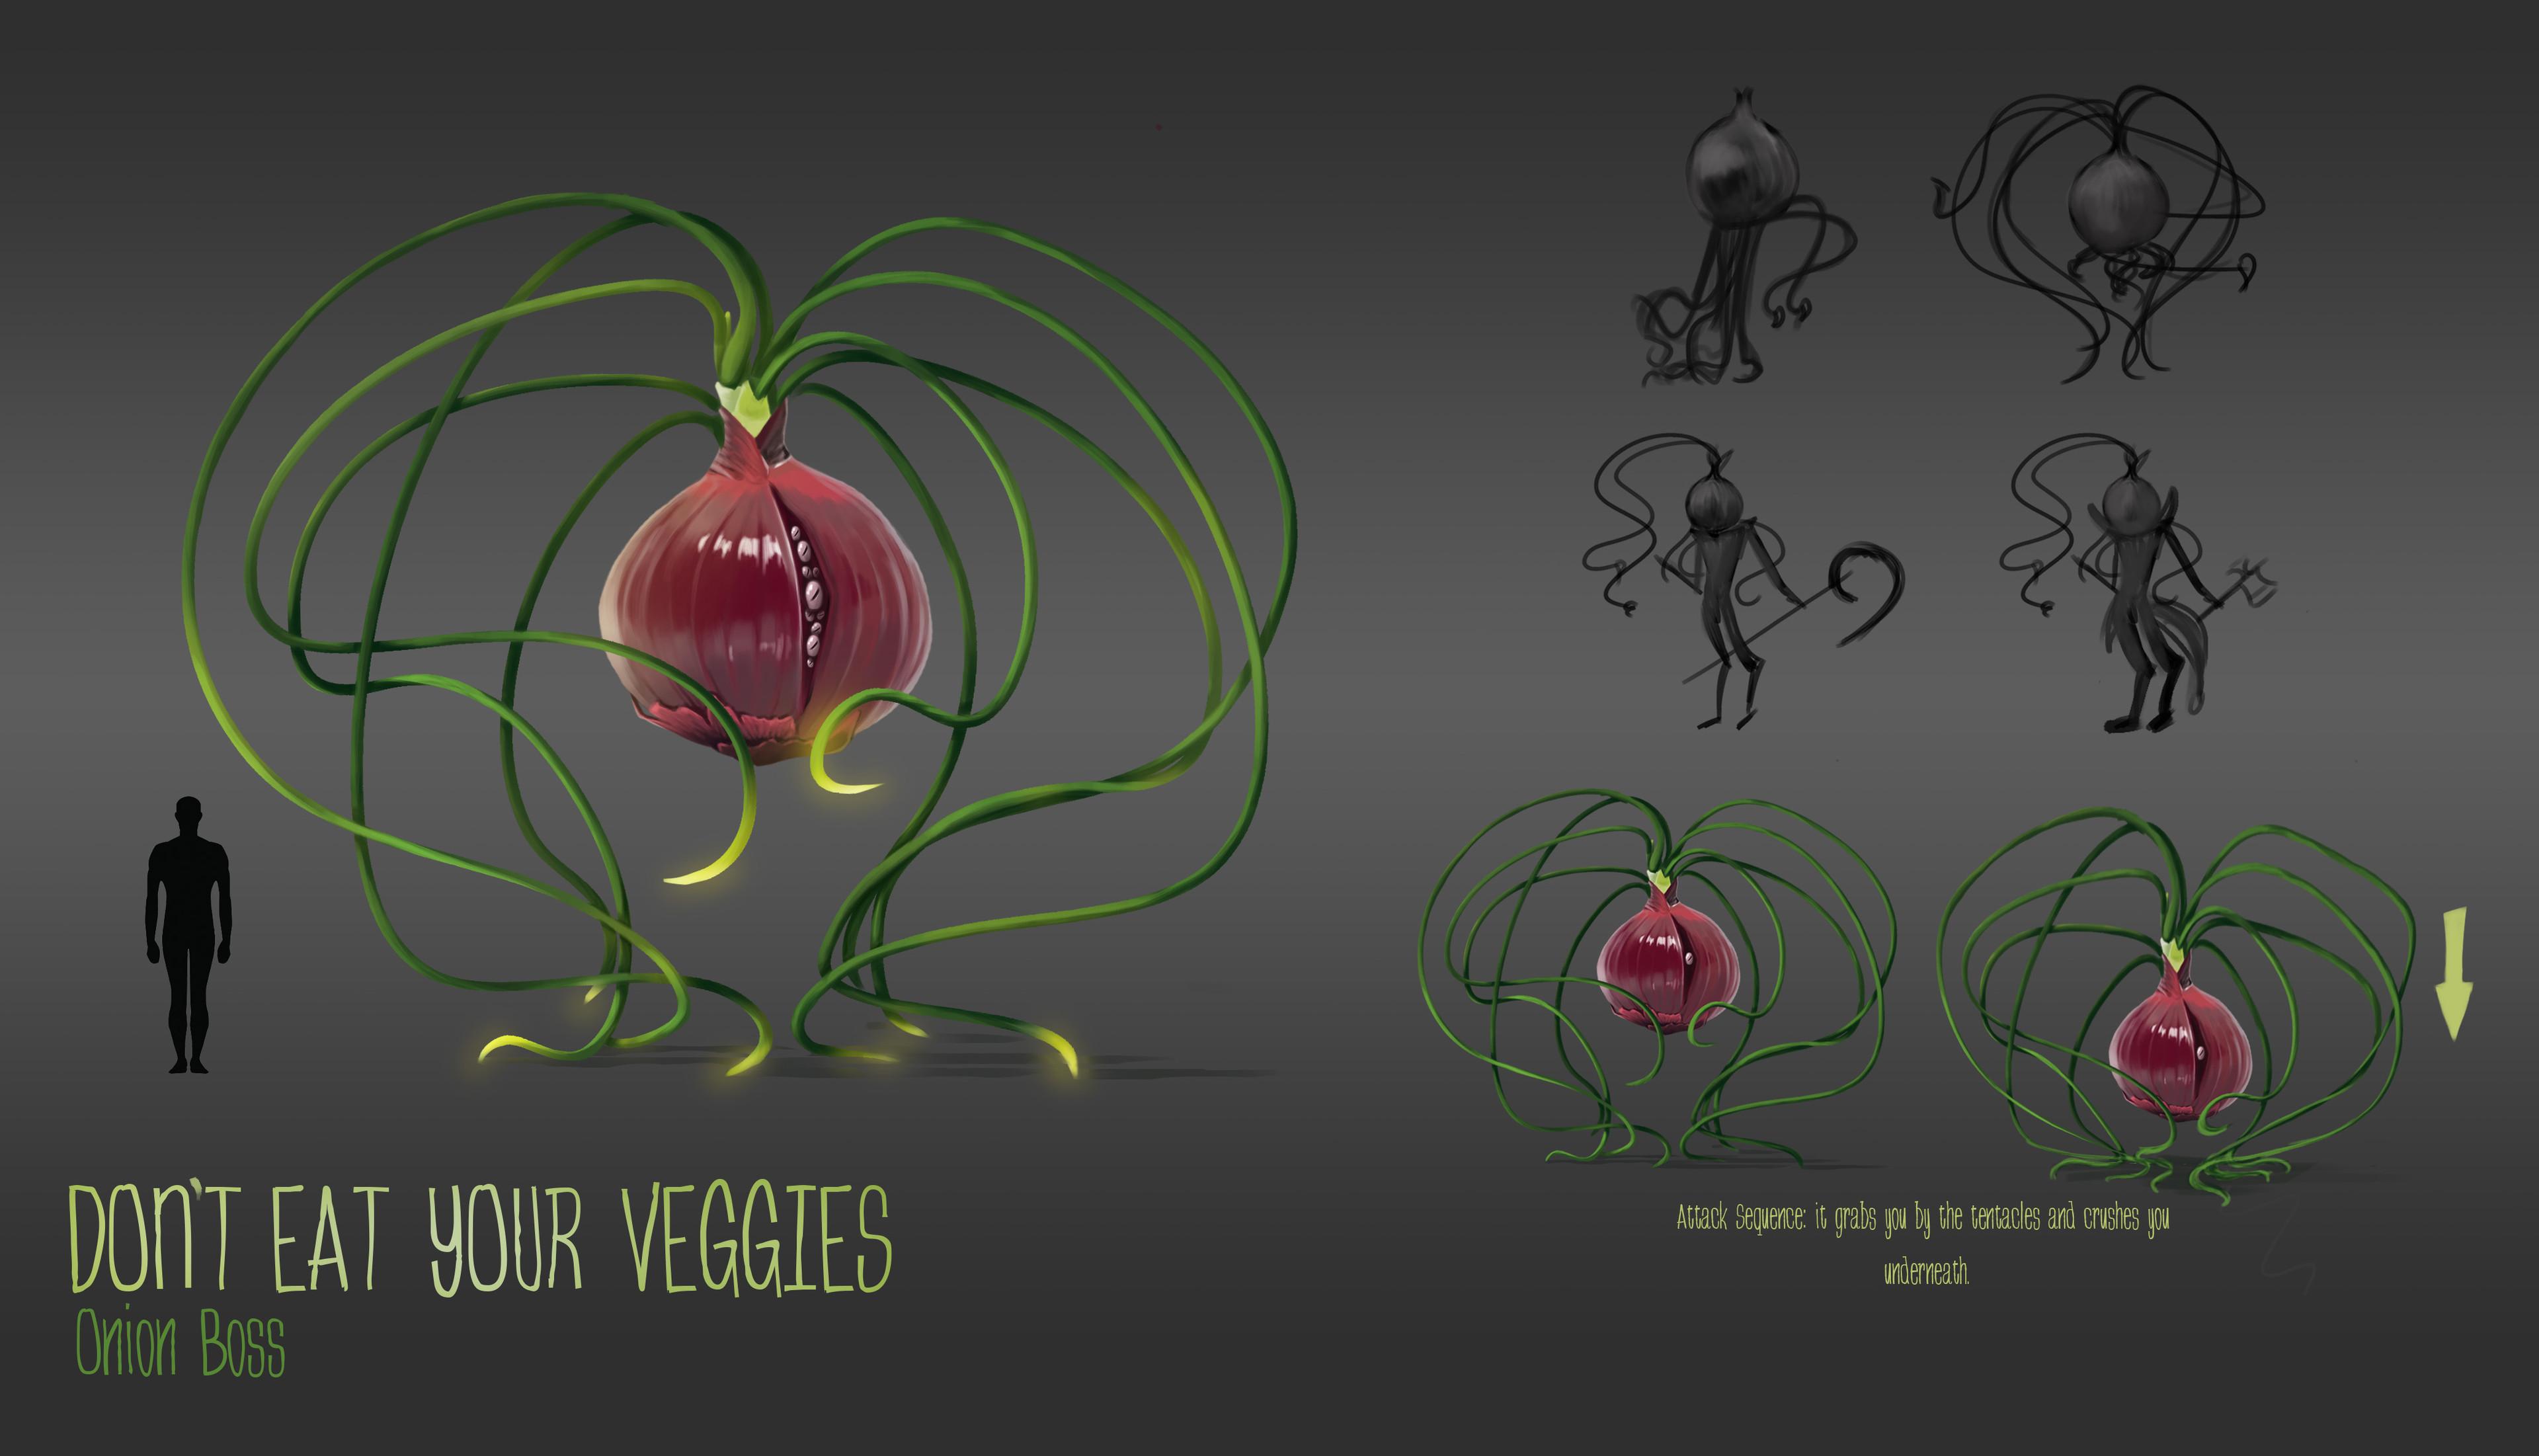 Development on the Onion Boss.